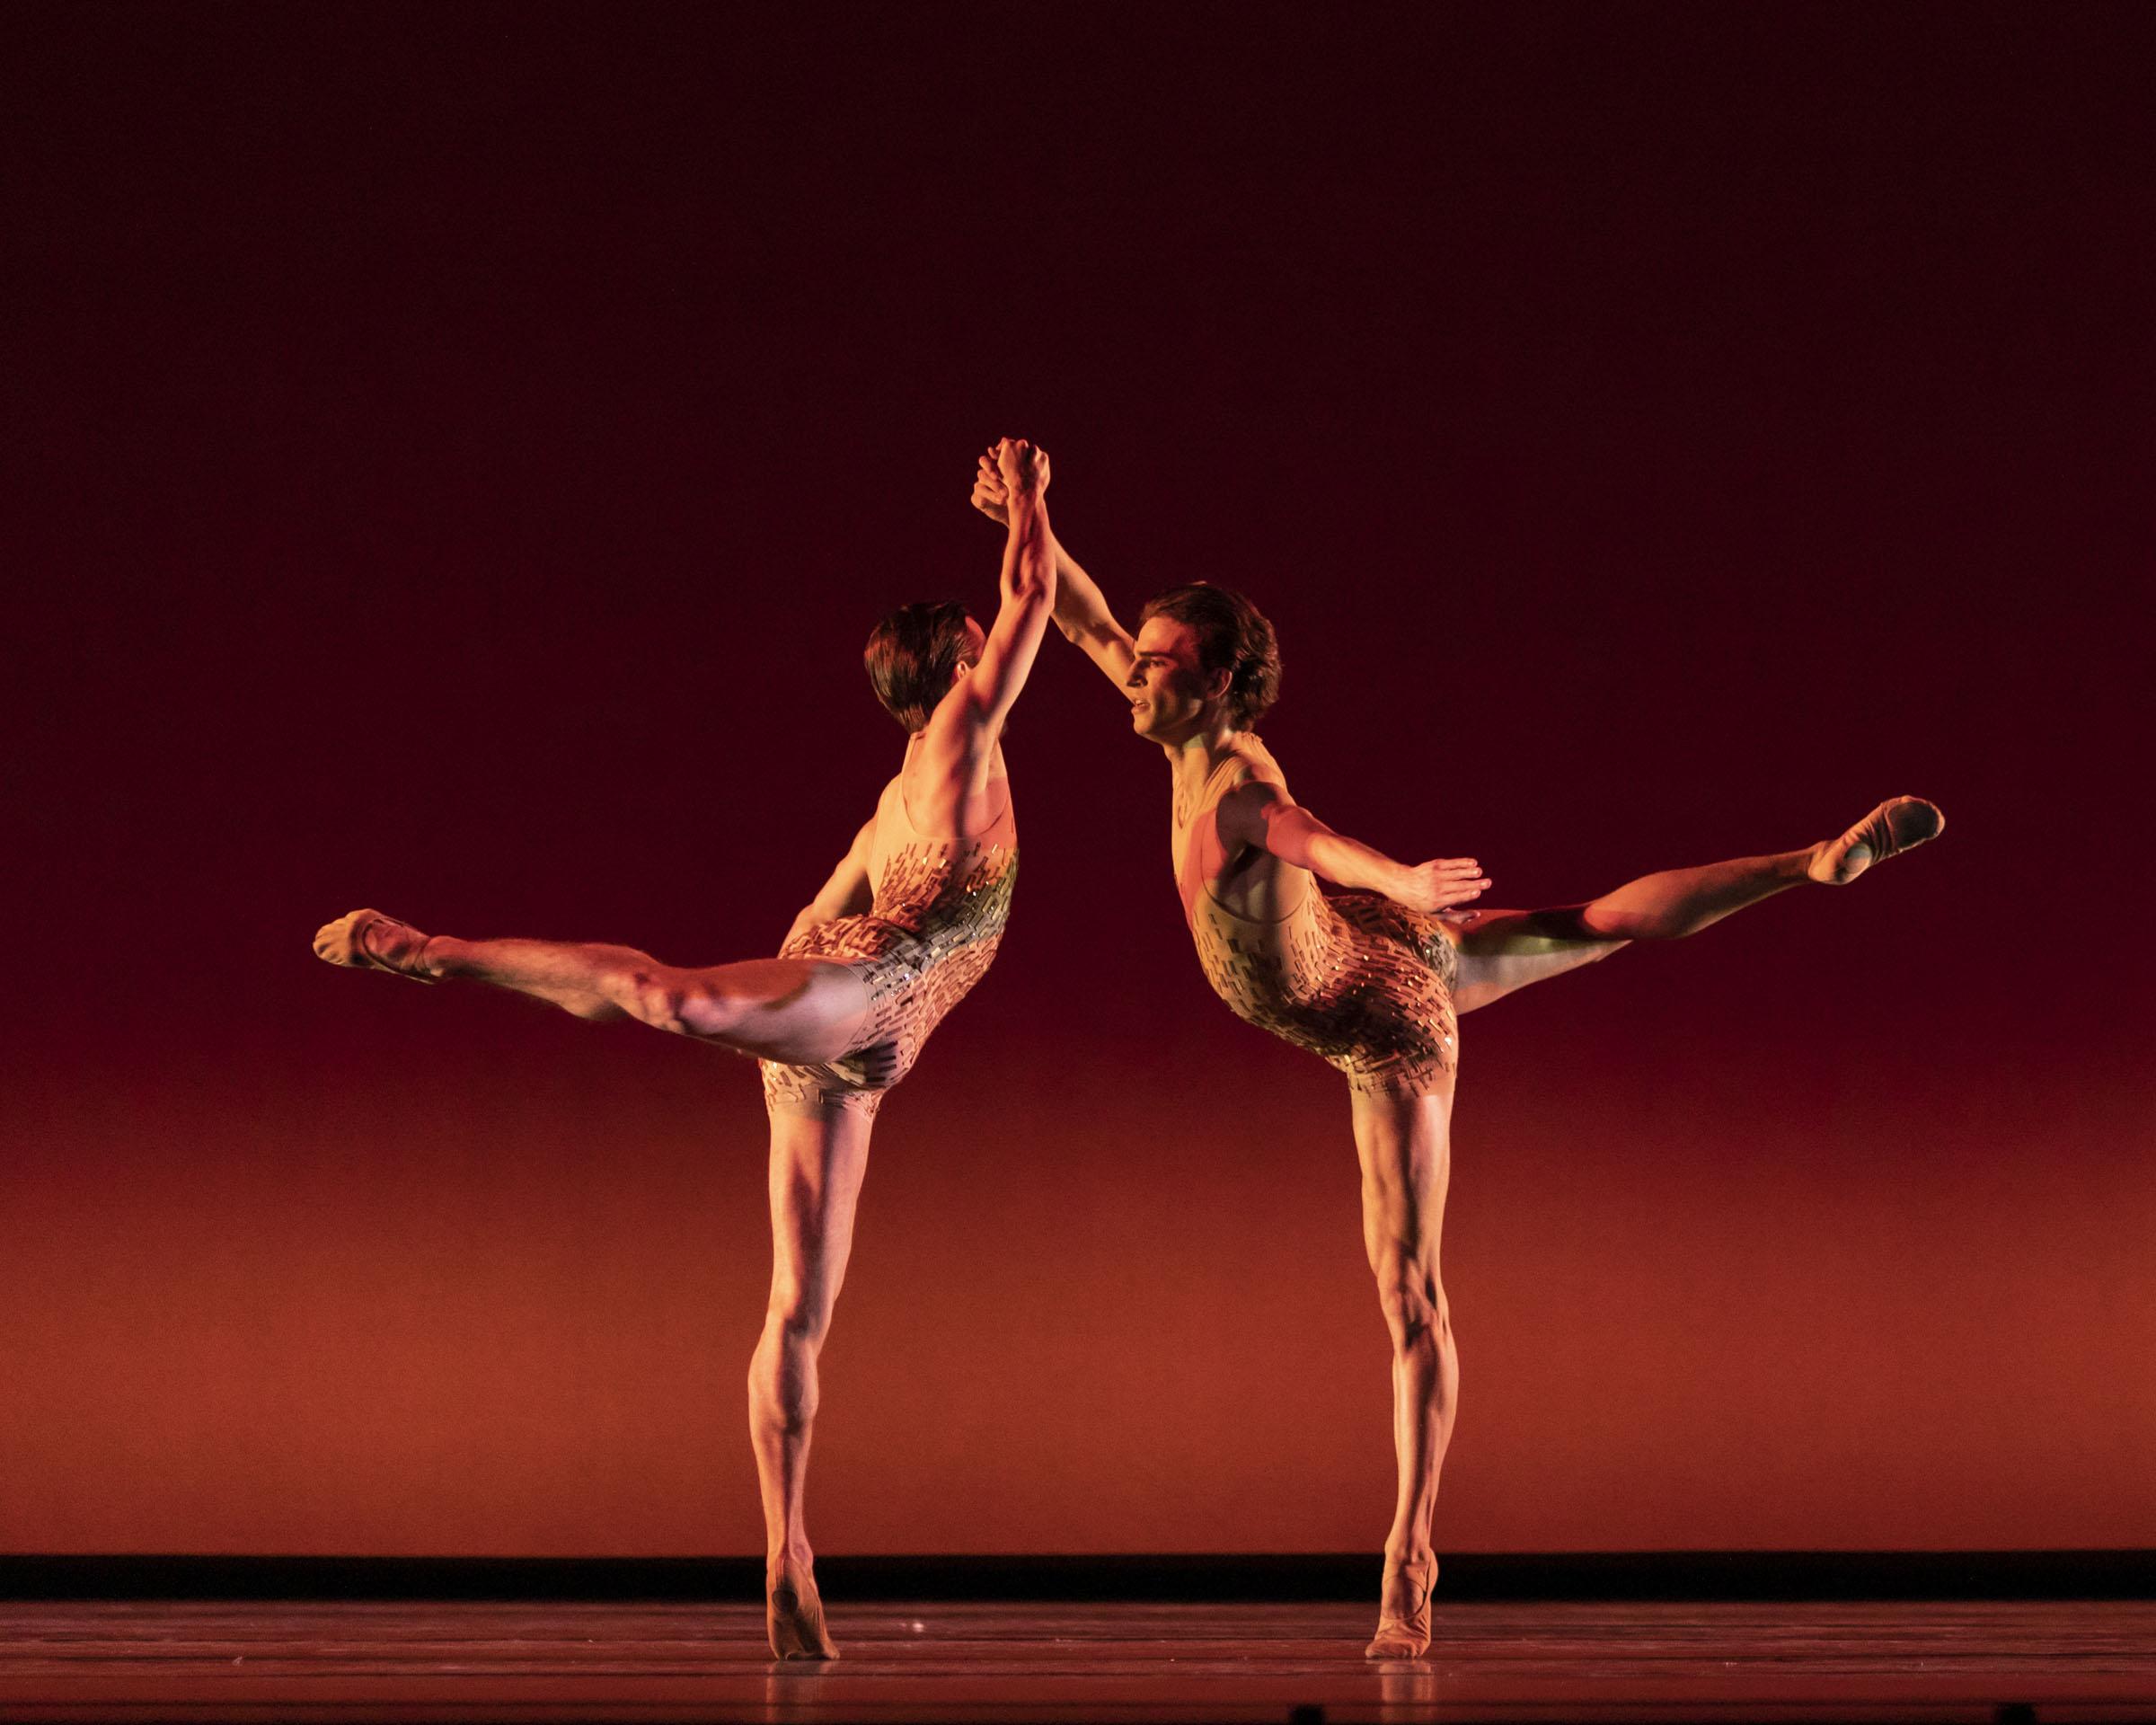 The Royal Opera House - Choreography by Christopher Wheeldon